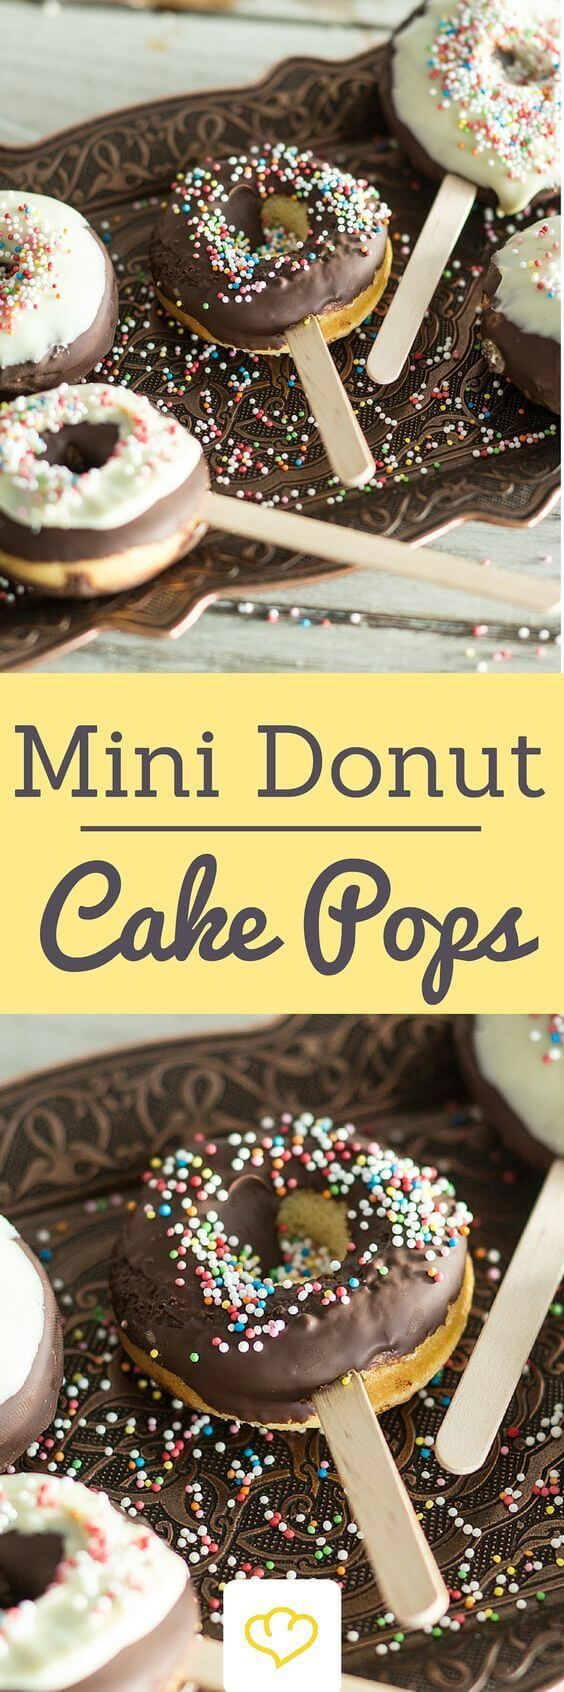 Donut Cake Pops selber machen